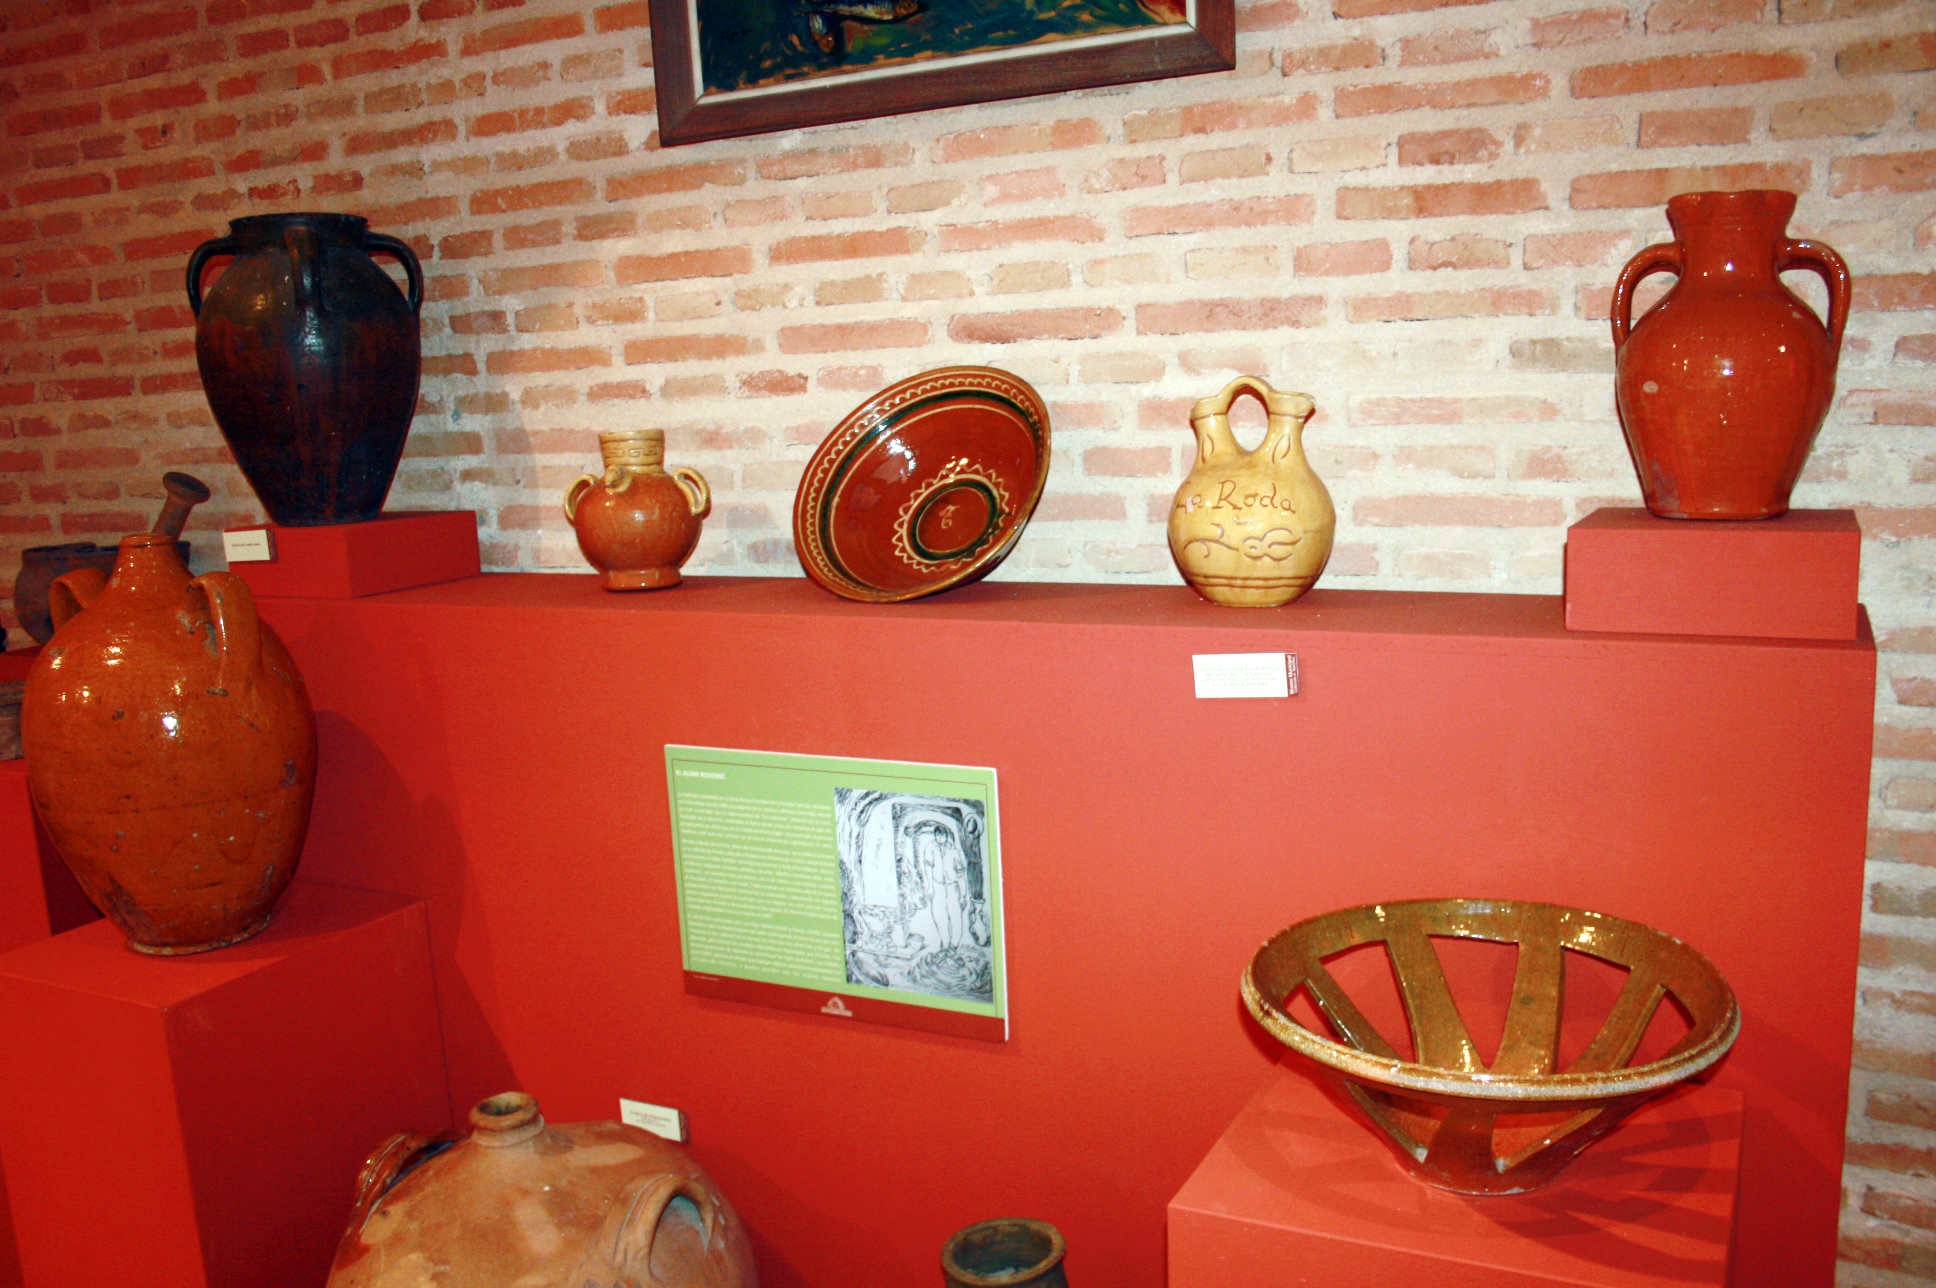 Museo Municipal De La Roda